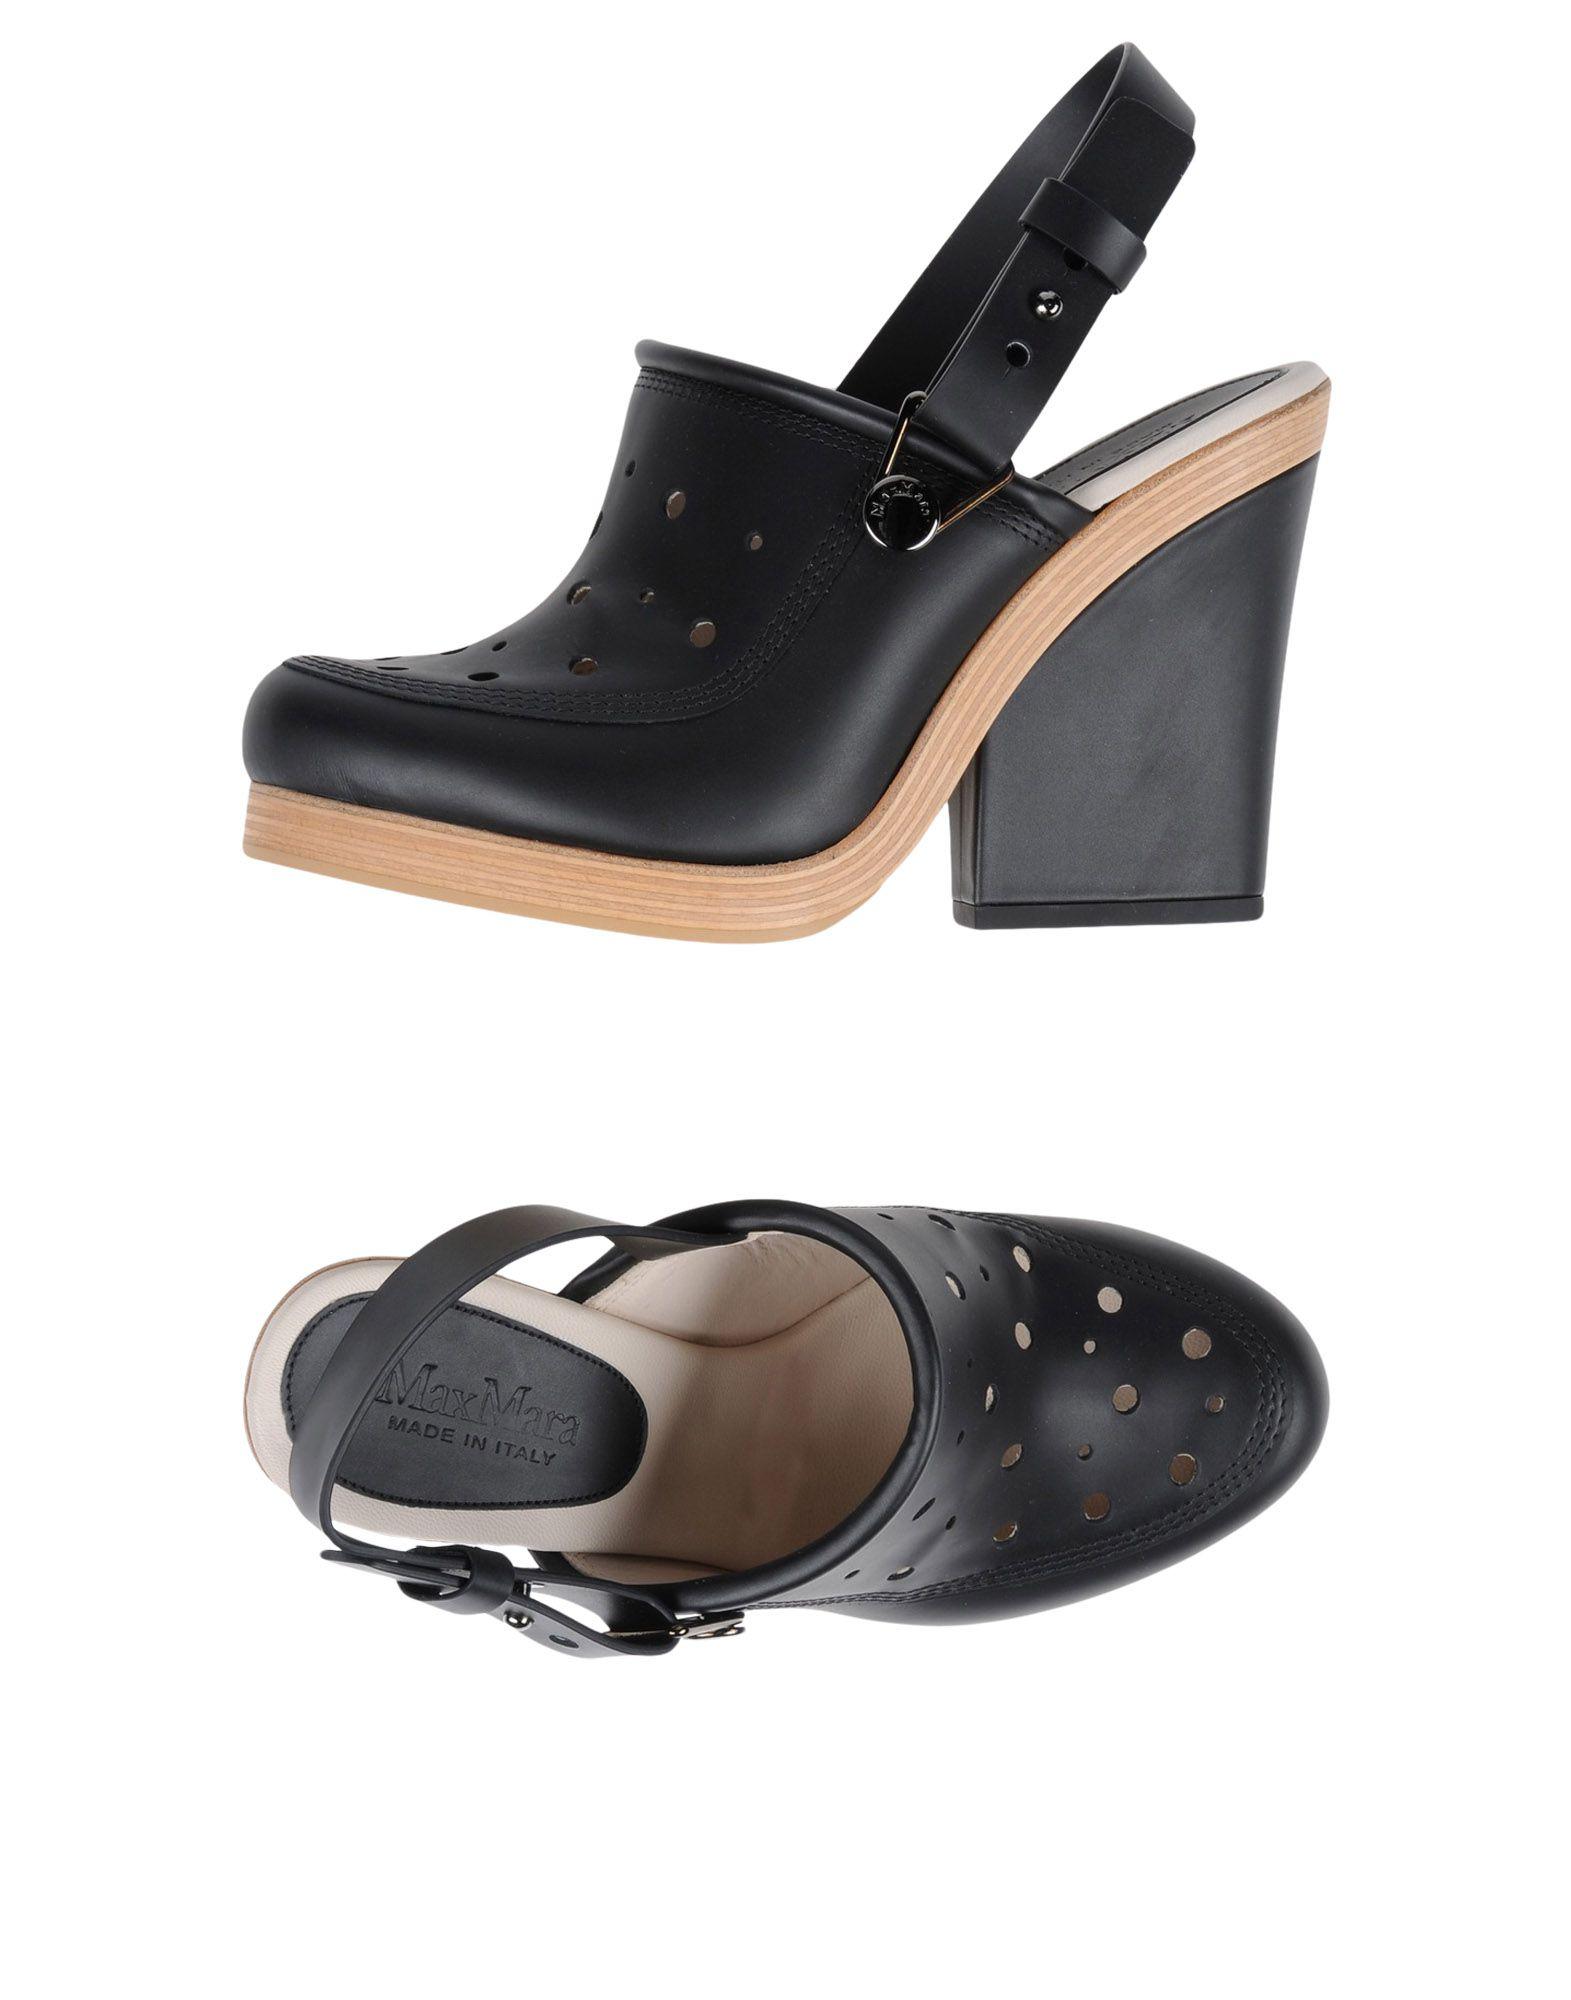 Stilvolle billige Sandalen Schuhe Max Mara Sandalen billige Damen  11422814WB 33d222